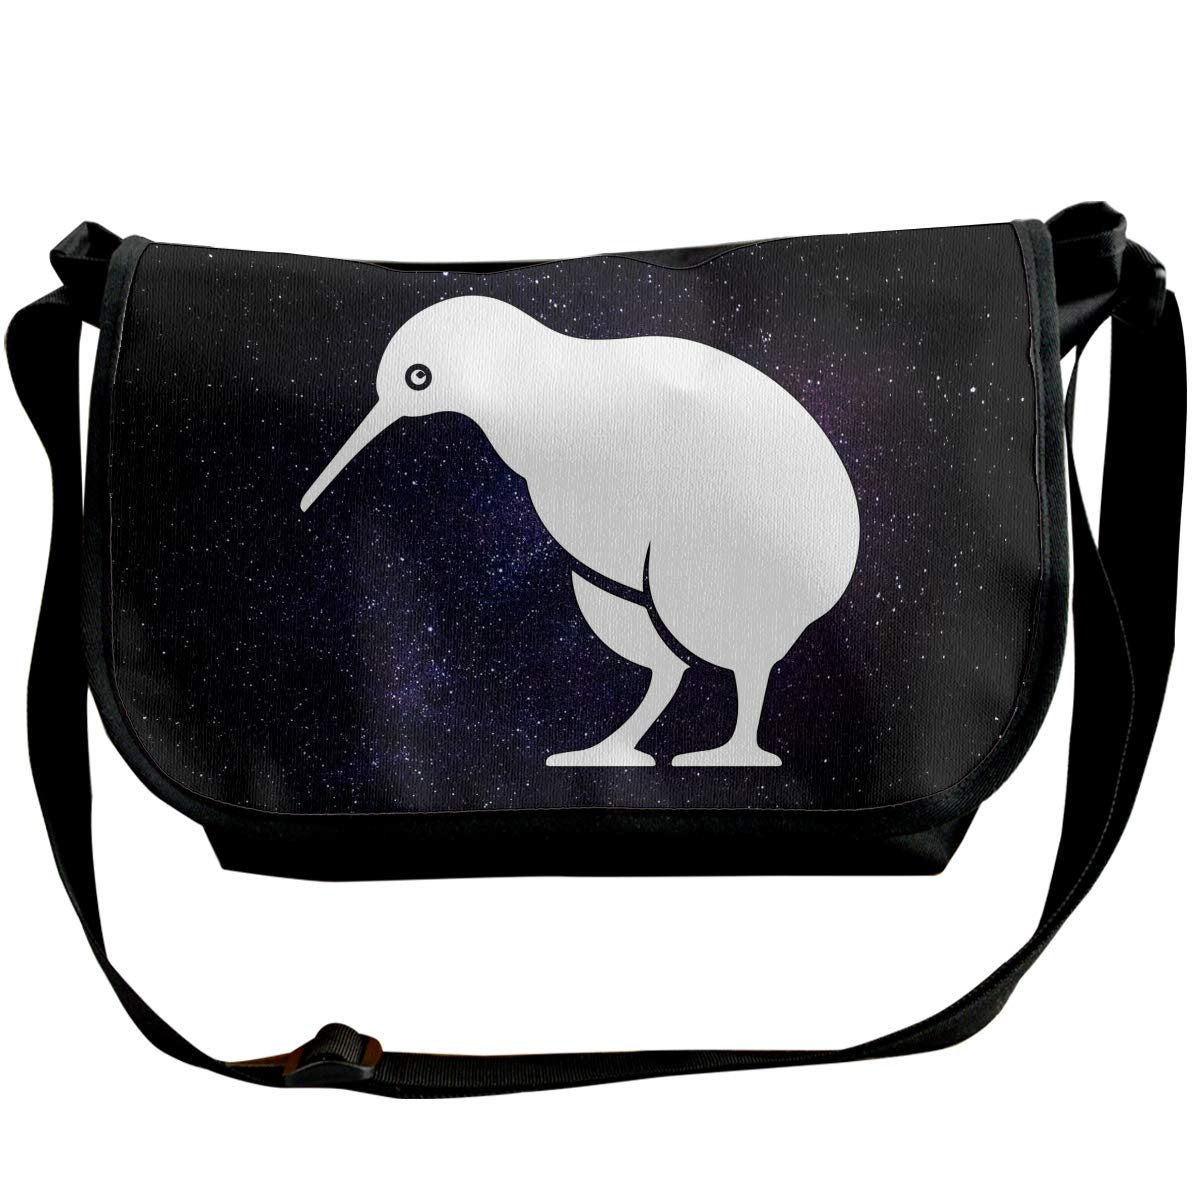 Kiwi Bird Unisex Cross Body Bags Personalized Handbag